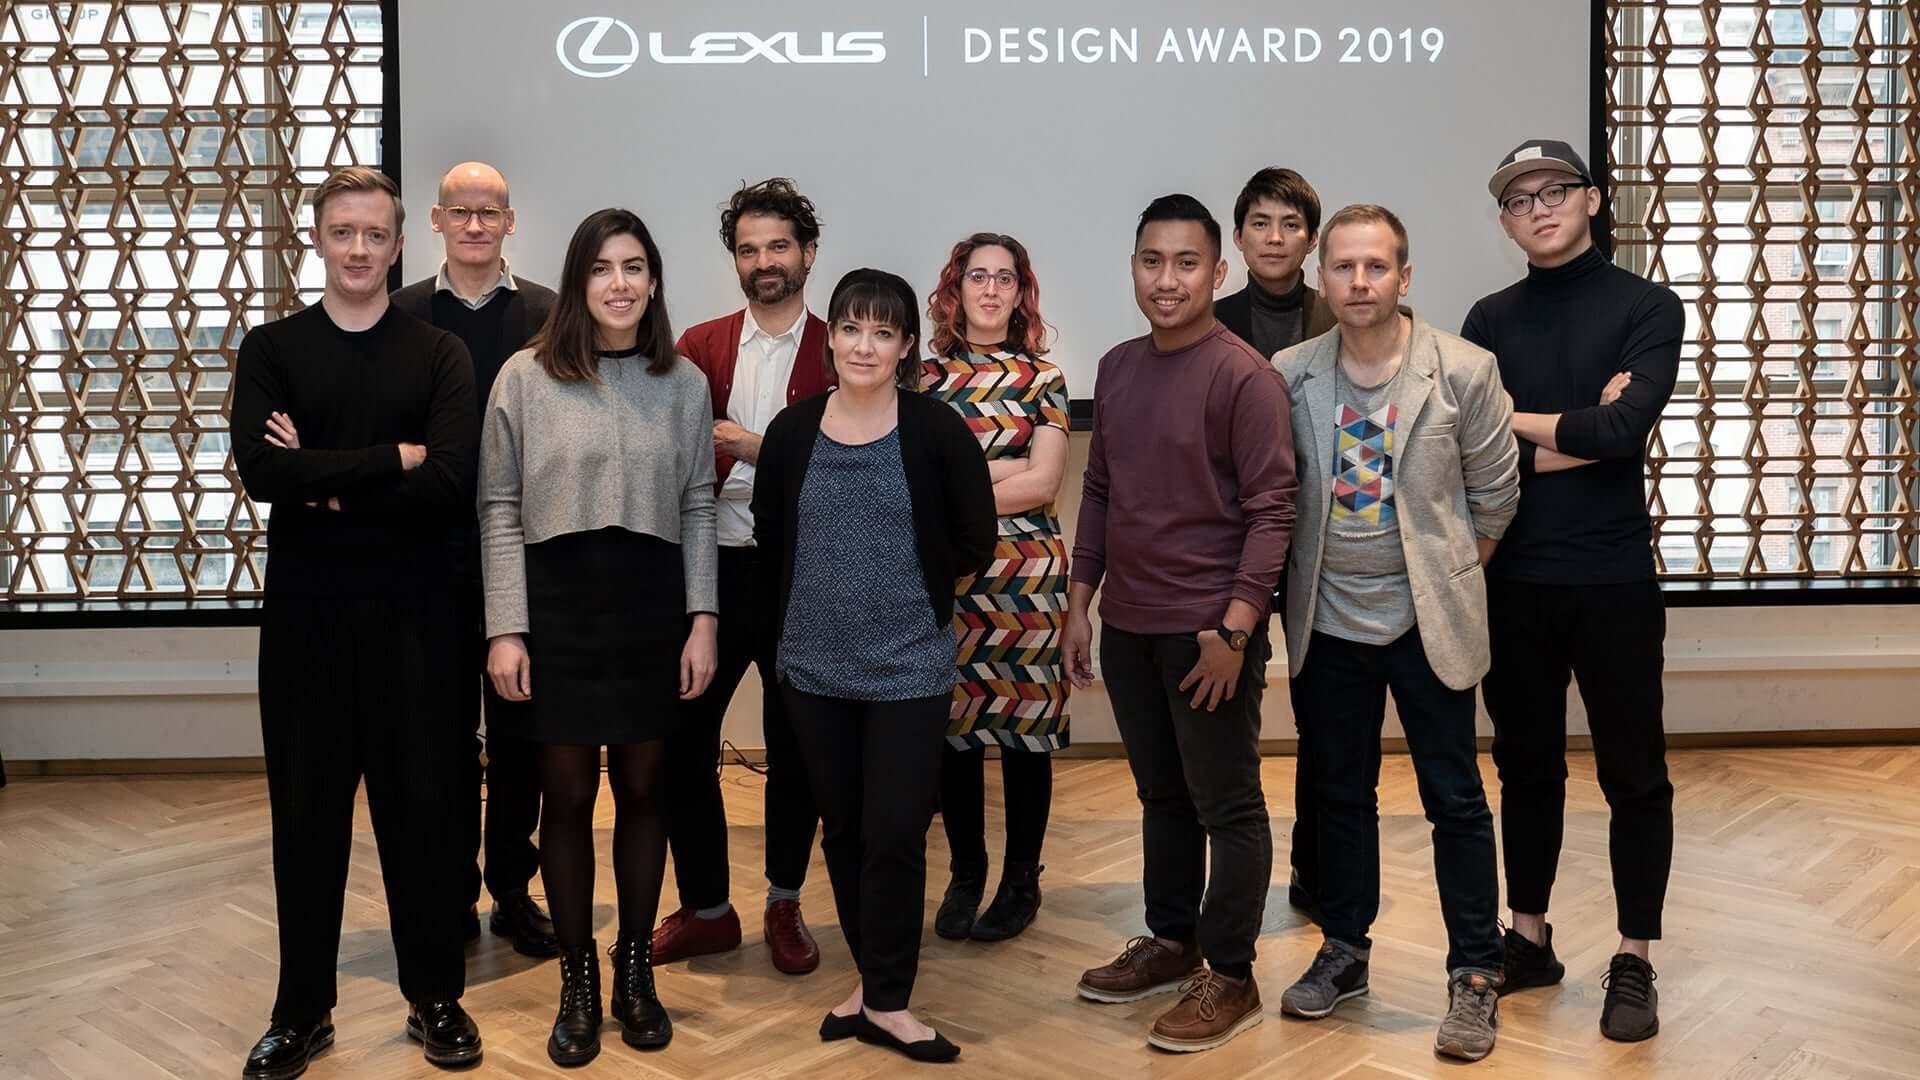 hero 1920x1080 lexus design awards